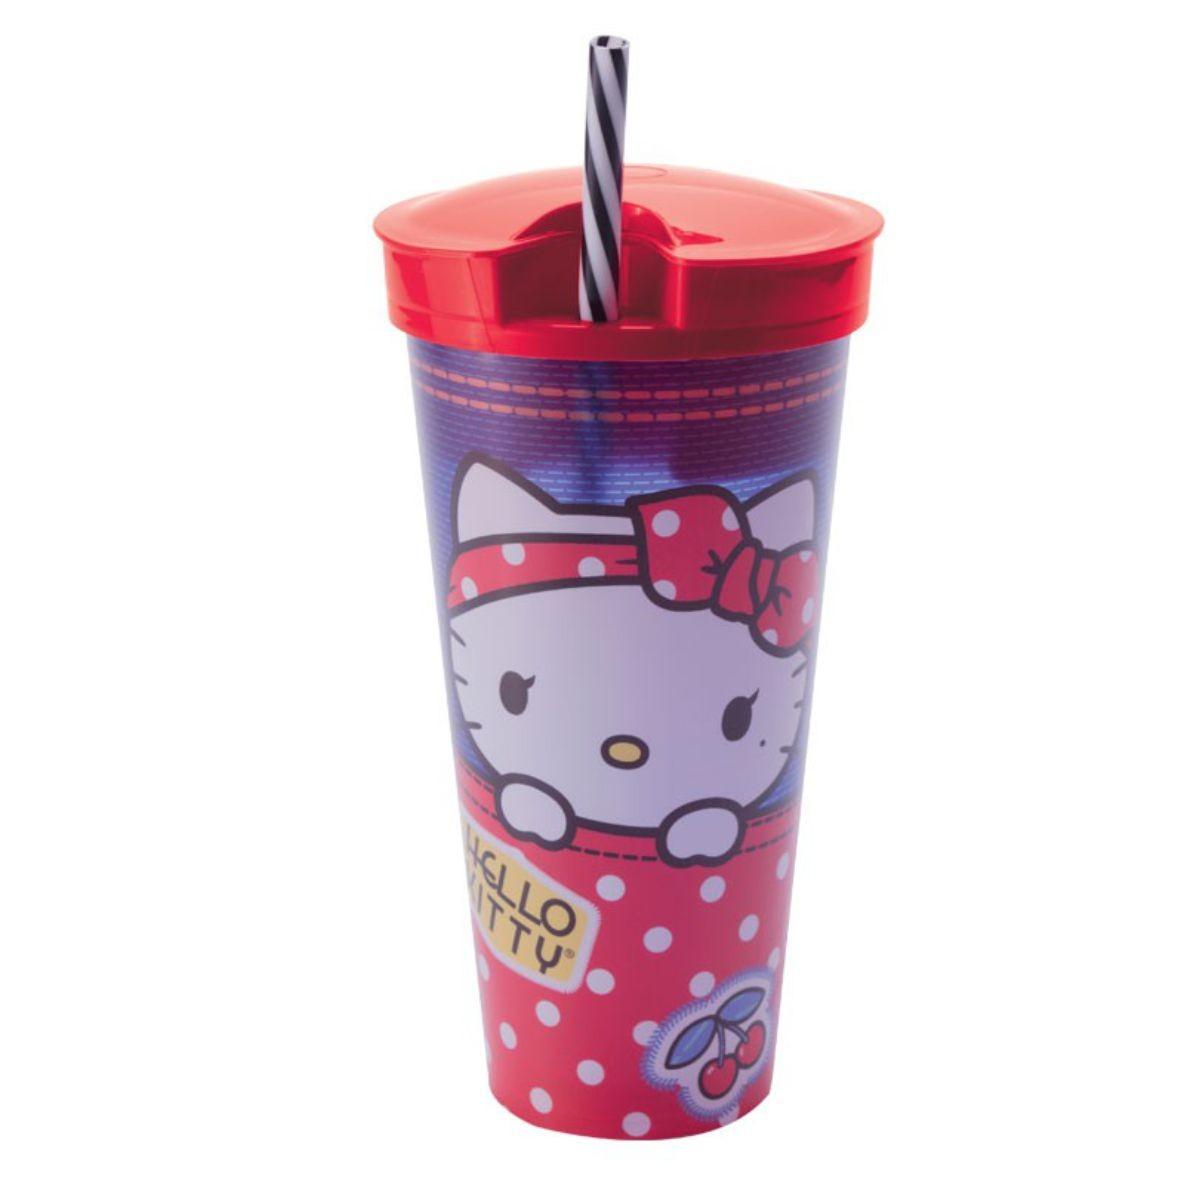 Copo 2 em 1 Hello Kitty 540 ml - Plasútil